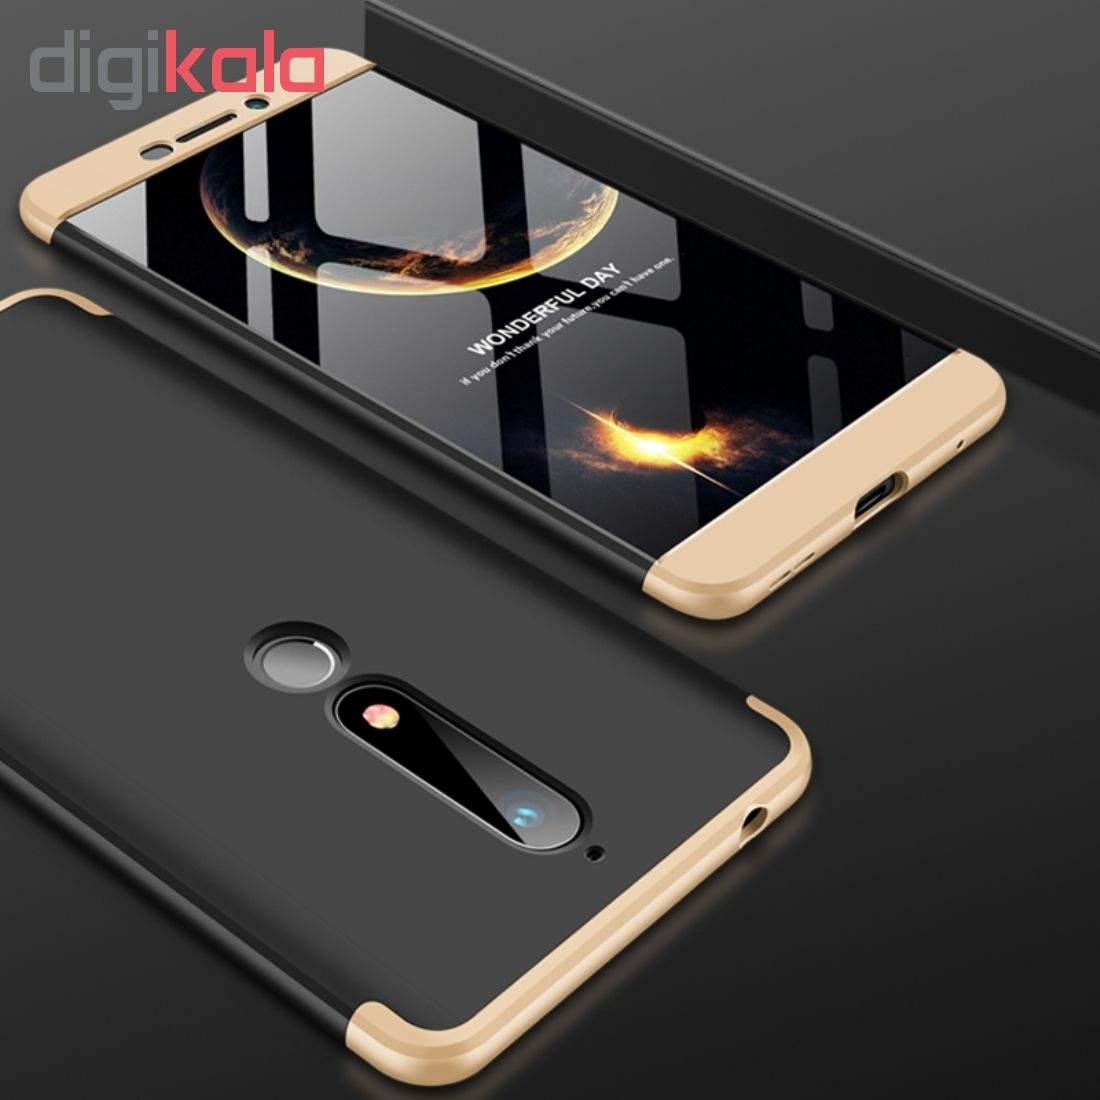 کاور 360 درجه جی کی کی مدل G-02 مناسب برای گوشی موبایل نوکیا 6 2018 main 1 4